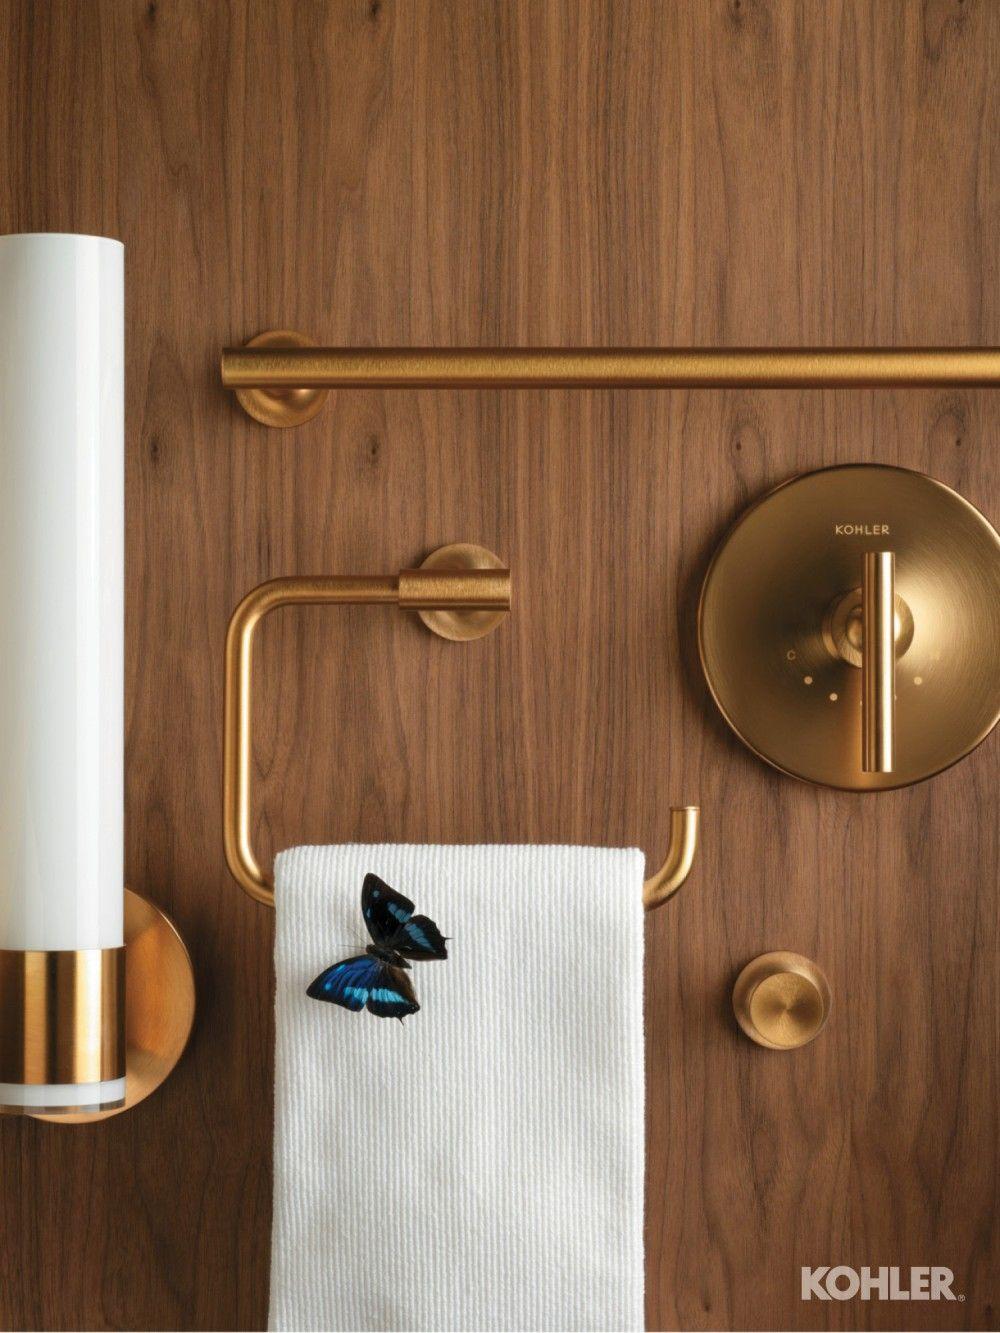 Gleaming Gold Bathroom Modern Towel Bars Bathroom Towel Bar